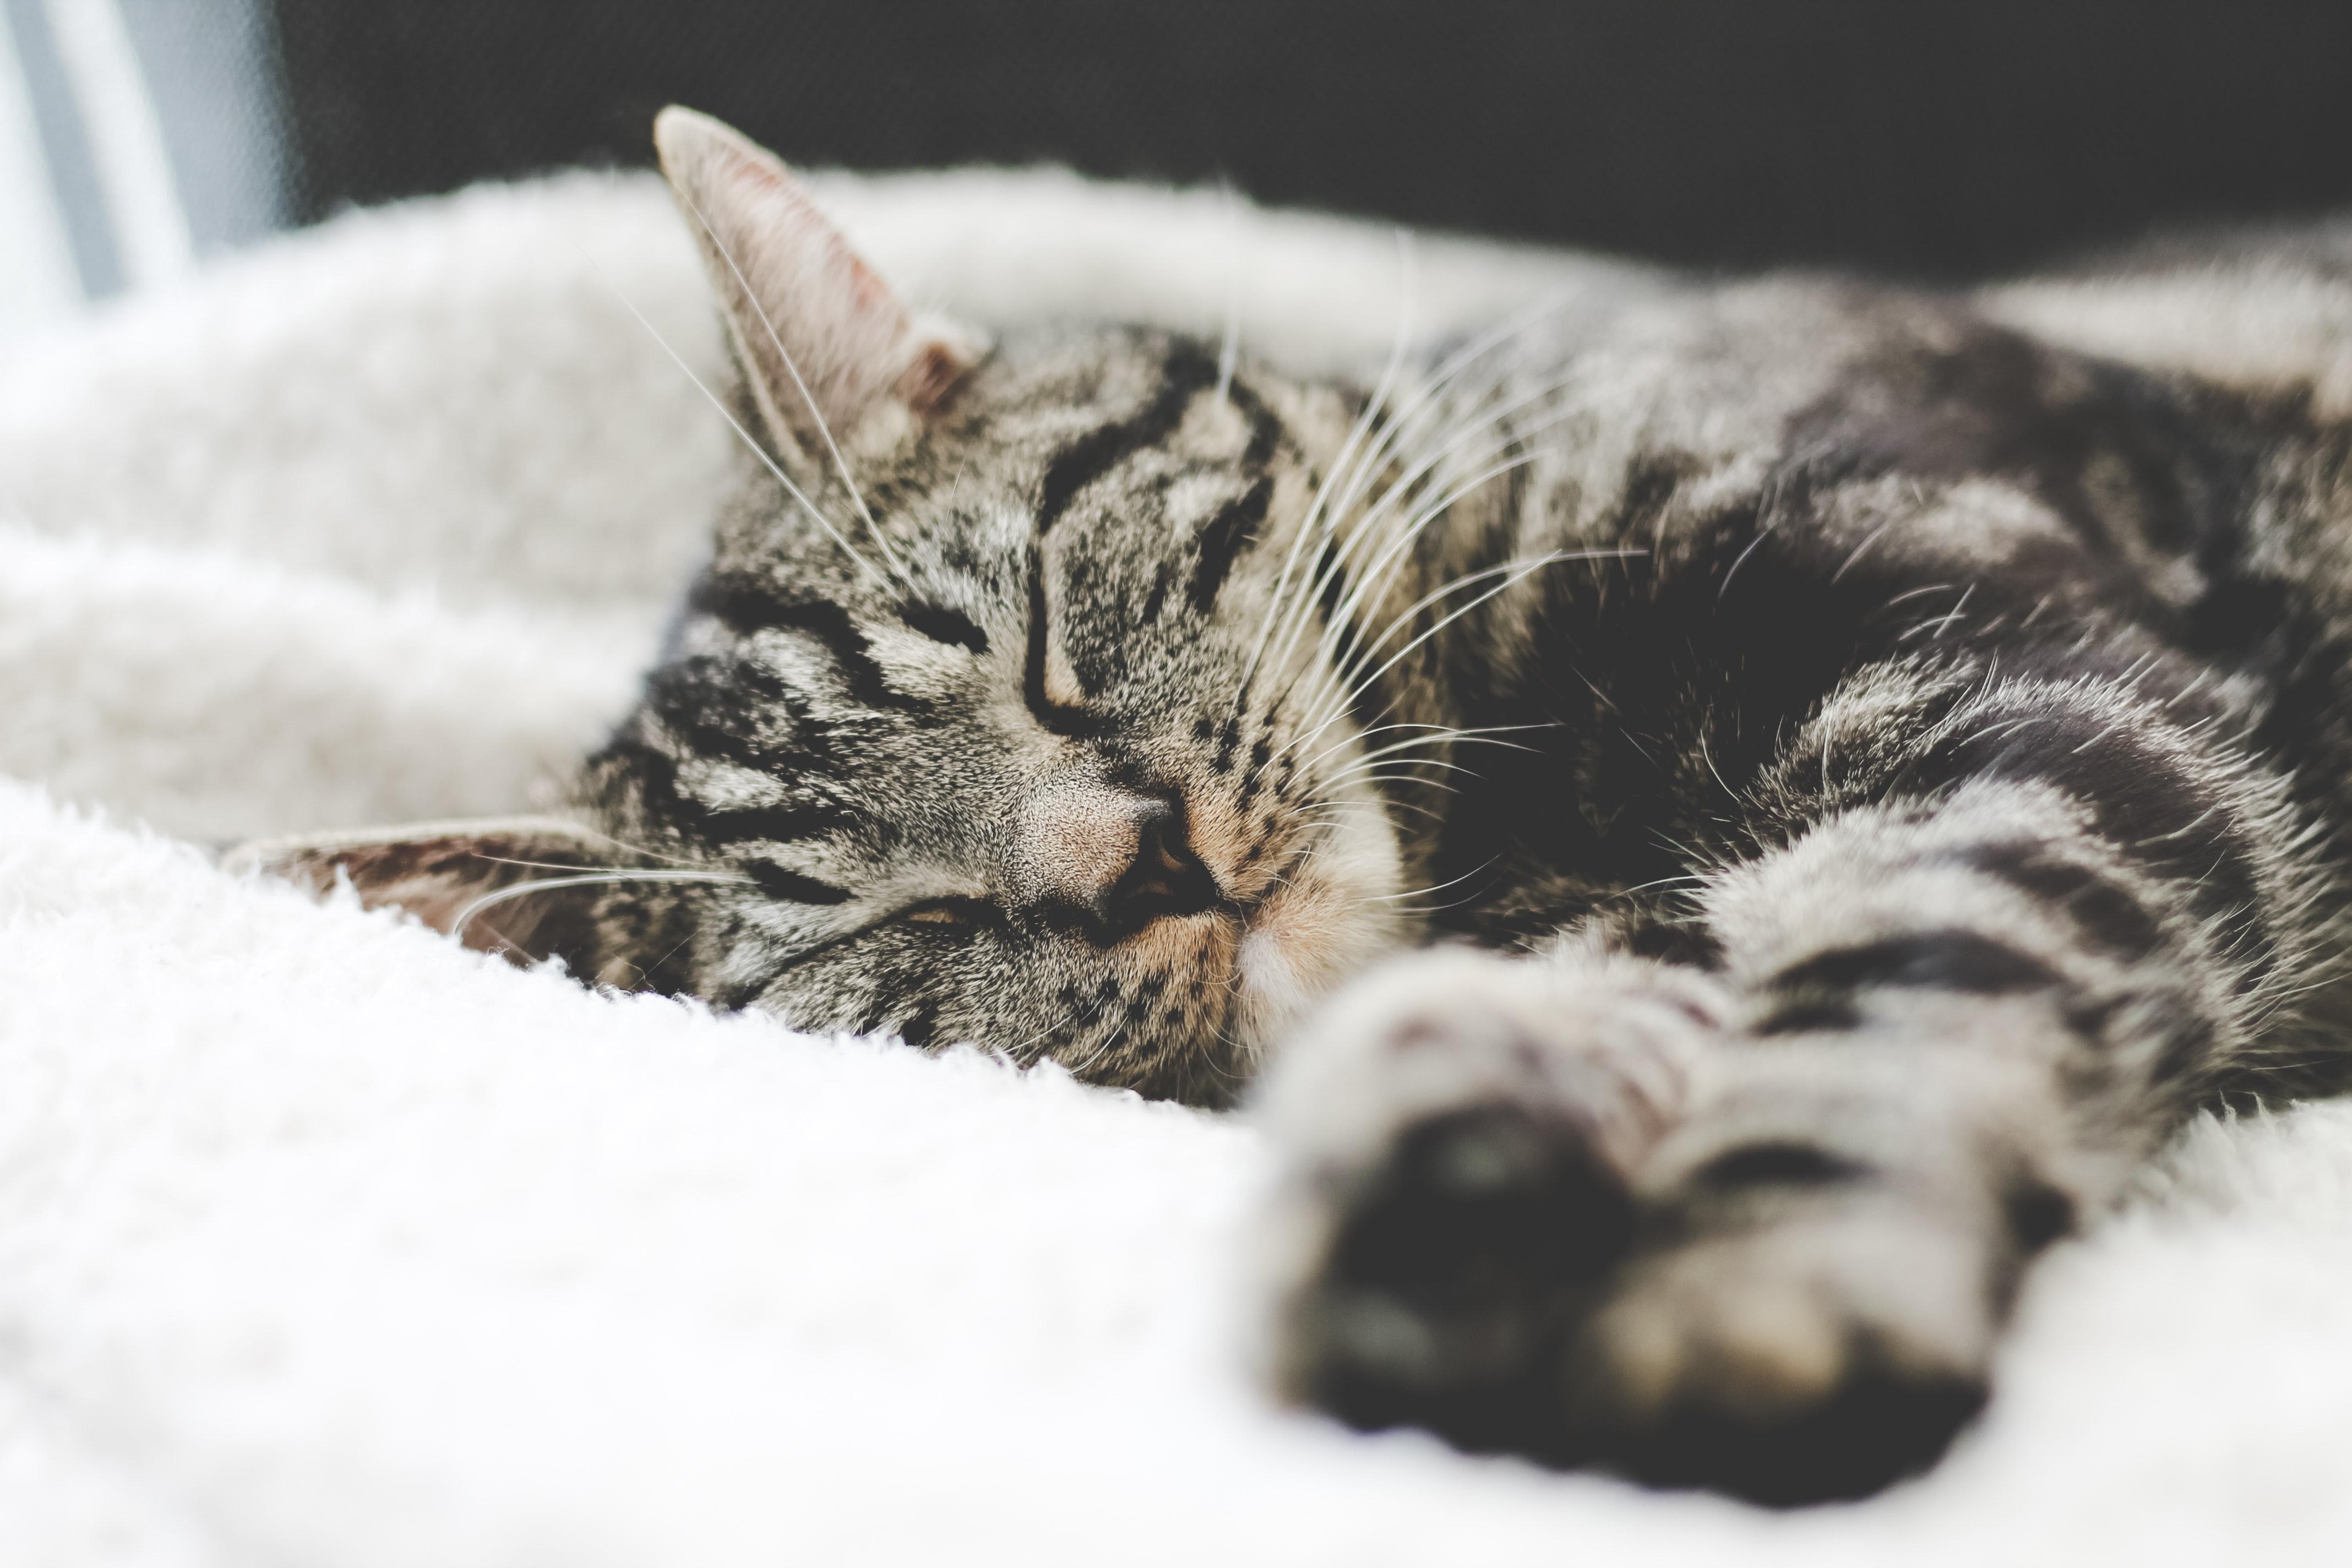 Grey, black and white sleeping cat on fluffy white blanket